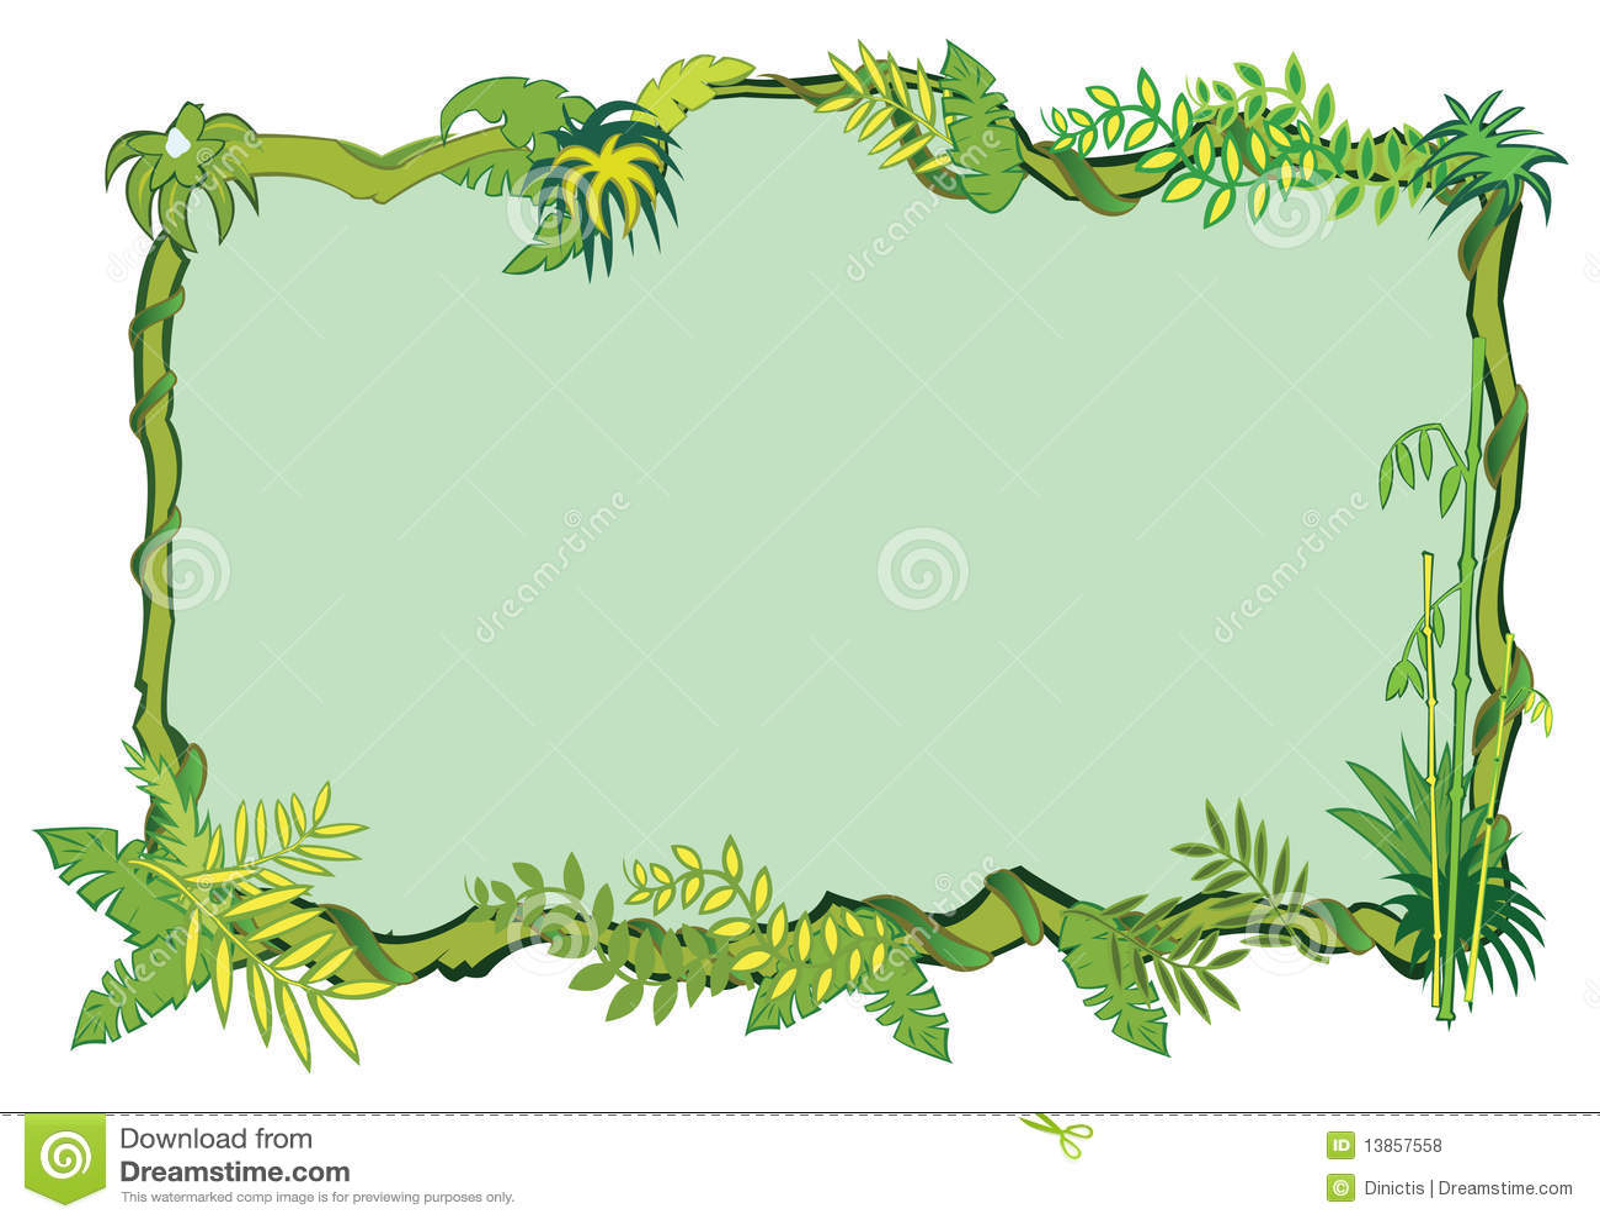 Jungle Safari Borders And Frames